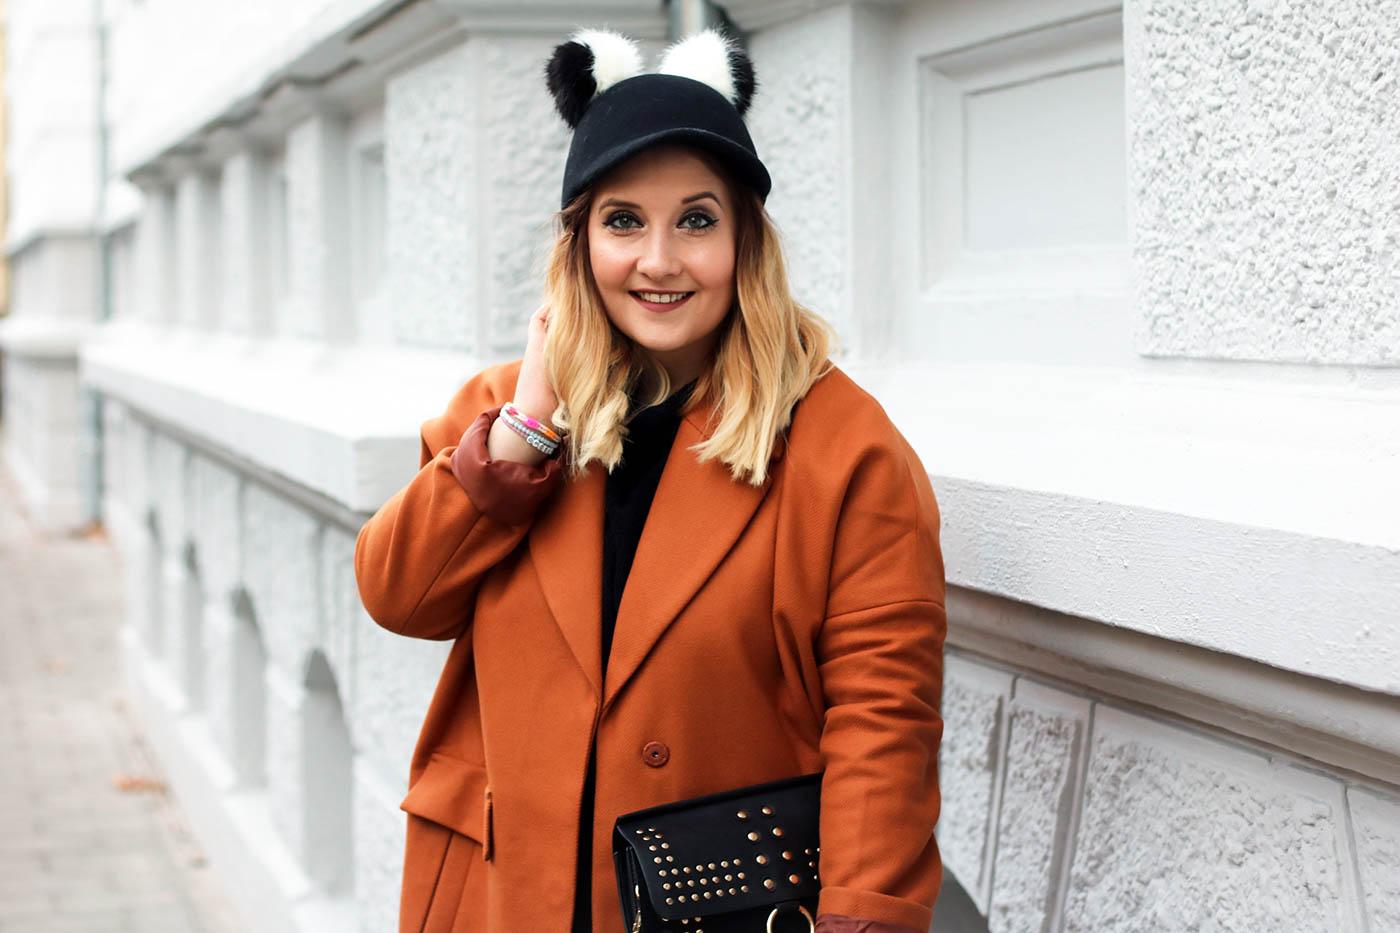 outfit-look-style-mantel-cappe-fashionblog-modeblog-gewinnspiel12